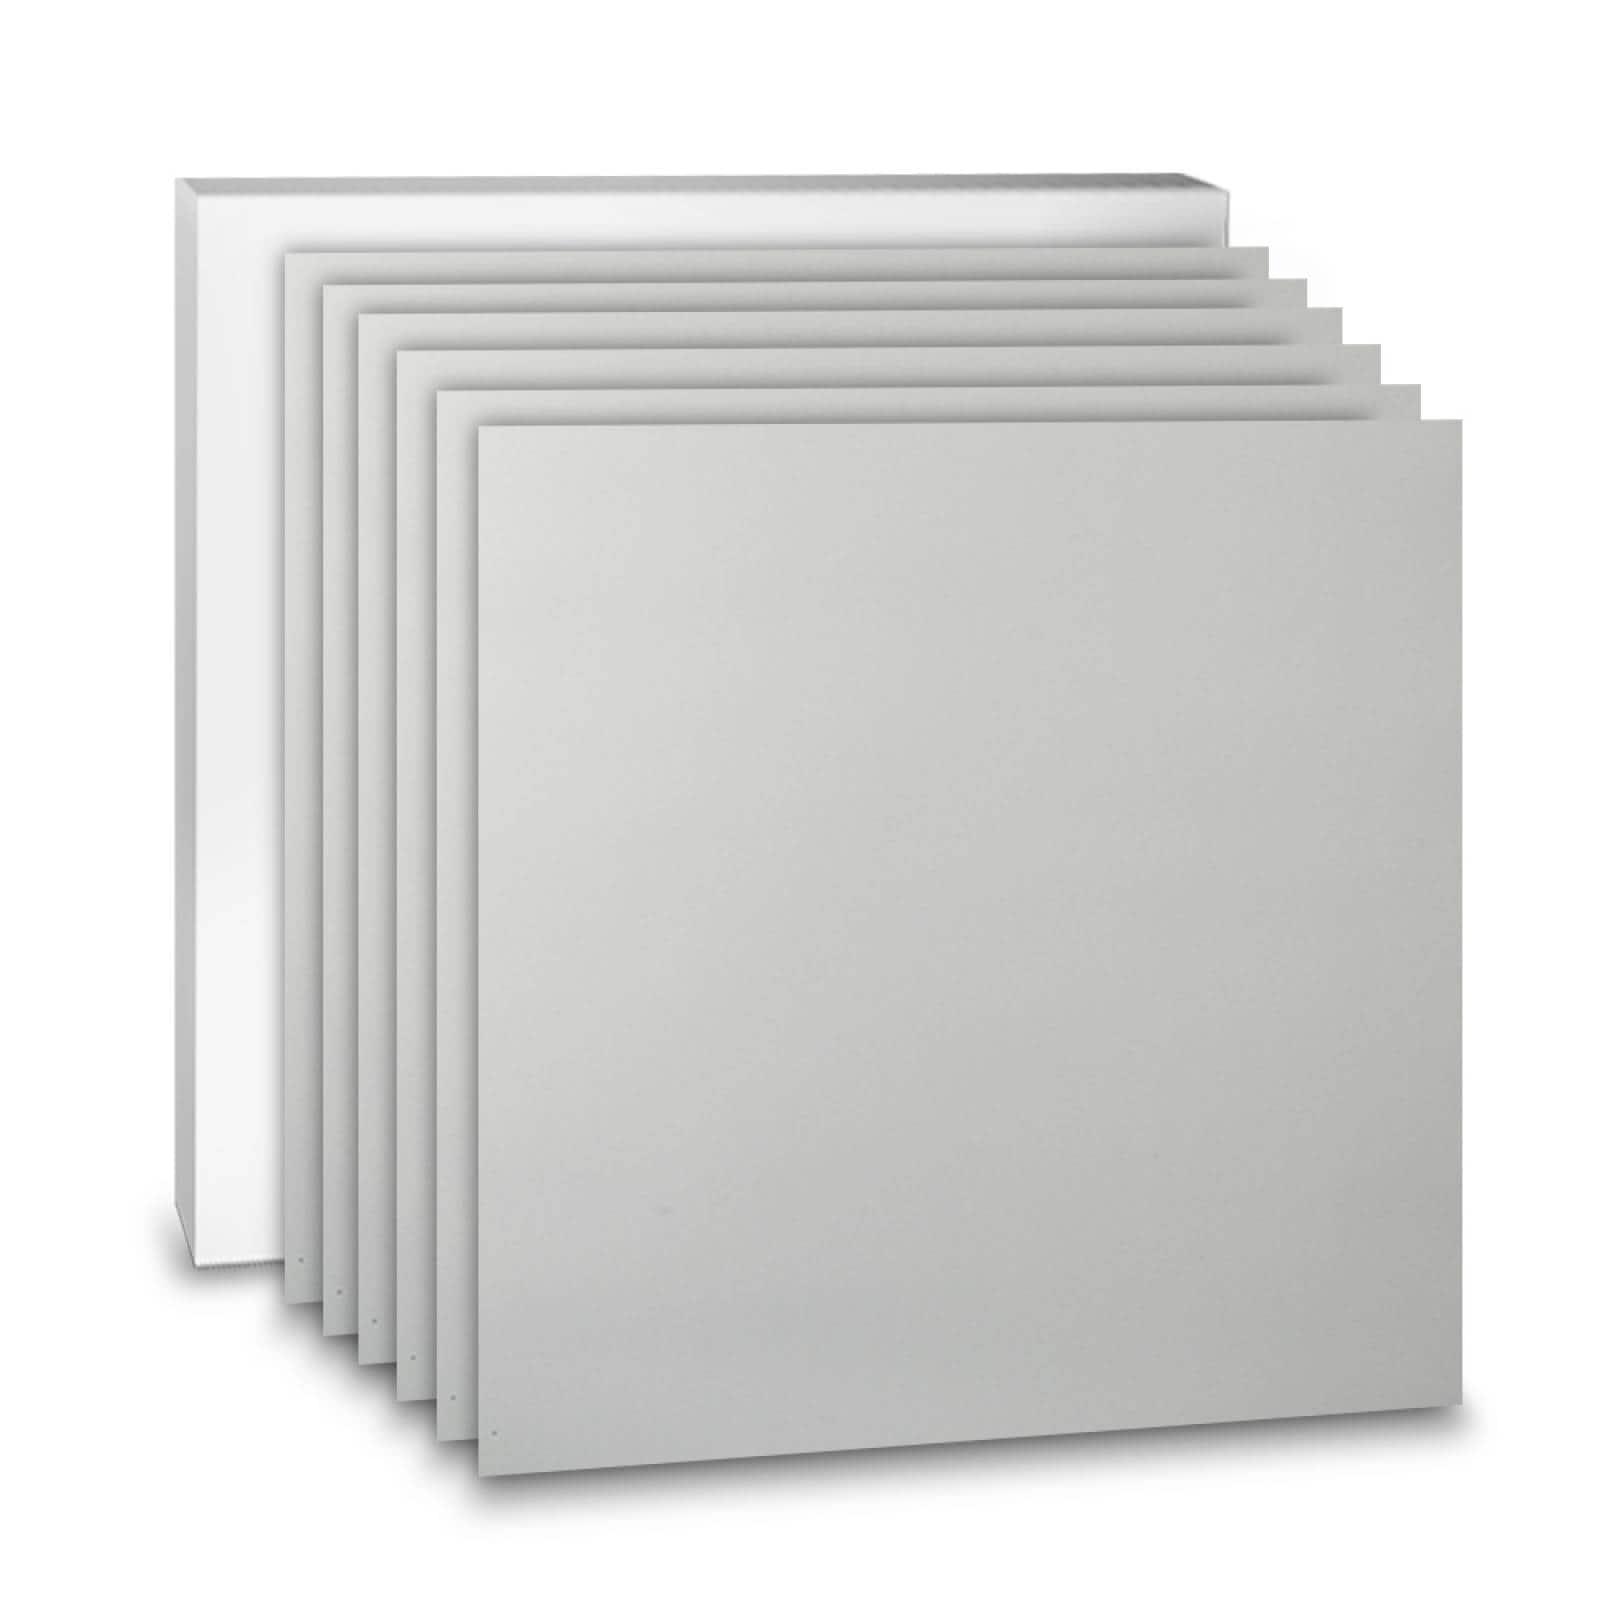 Aislante Cerámico Protector Térmico para Techo de 60 x 60 cm Blanco, Paquete 6 Piezas, Mod: 2PTTP6Bl